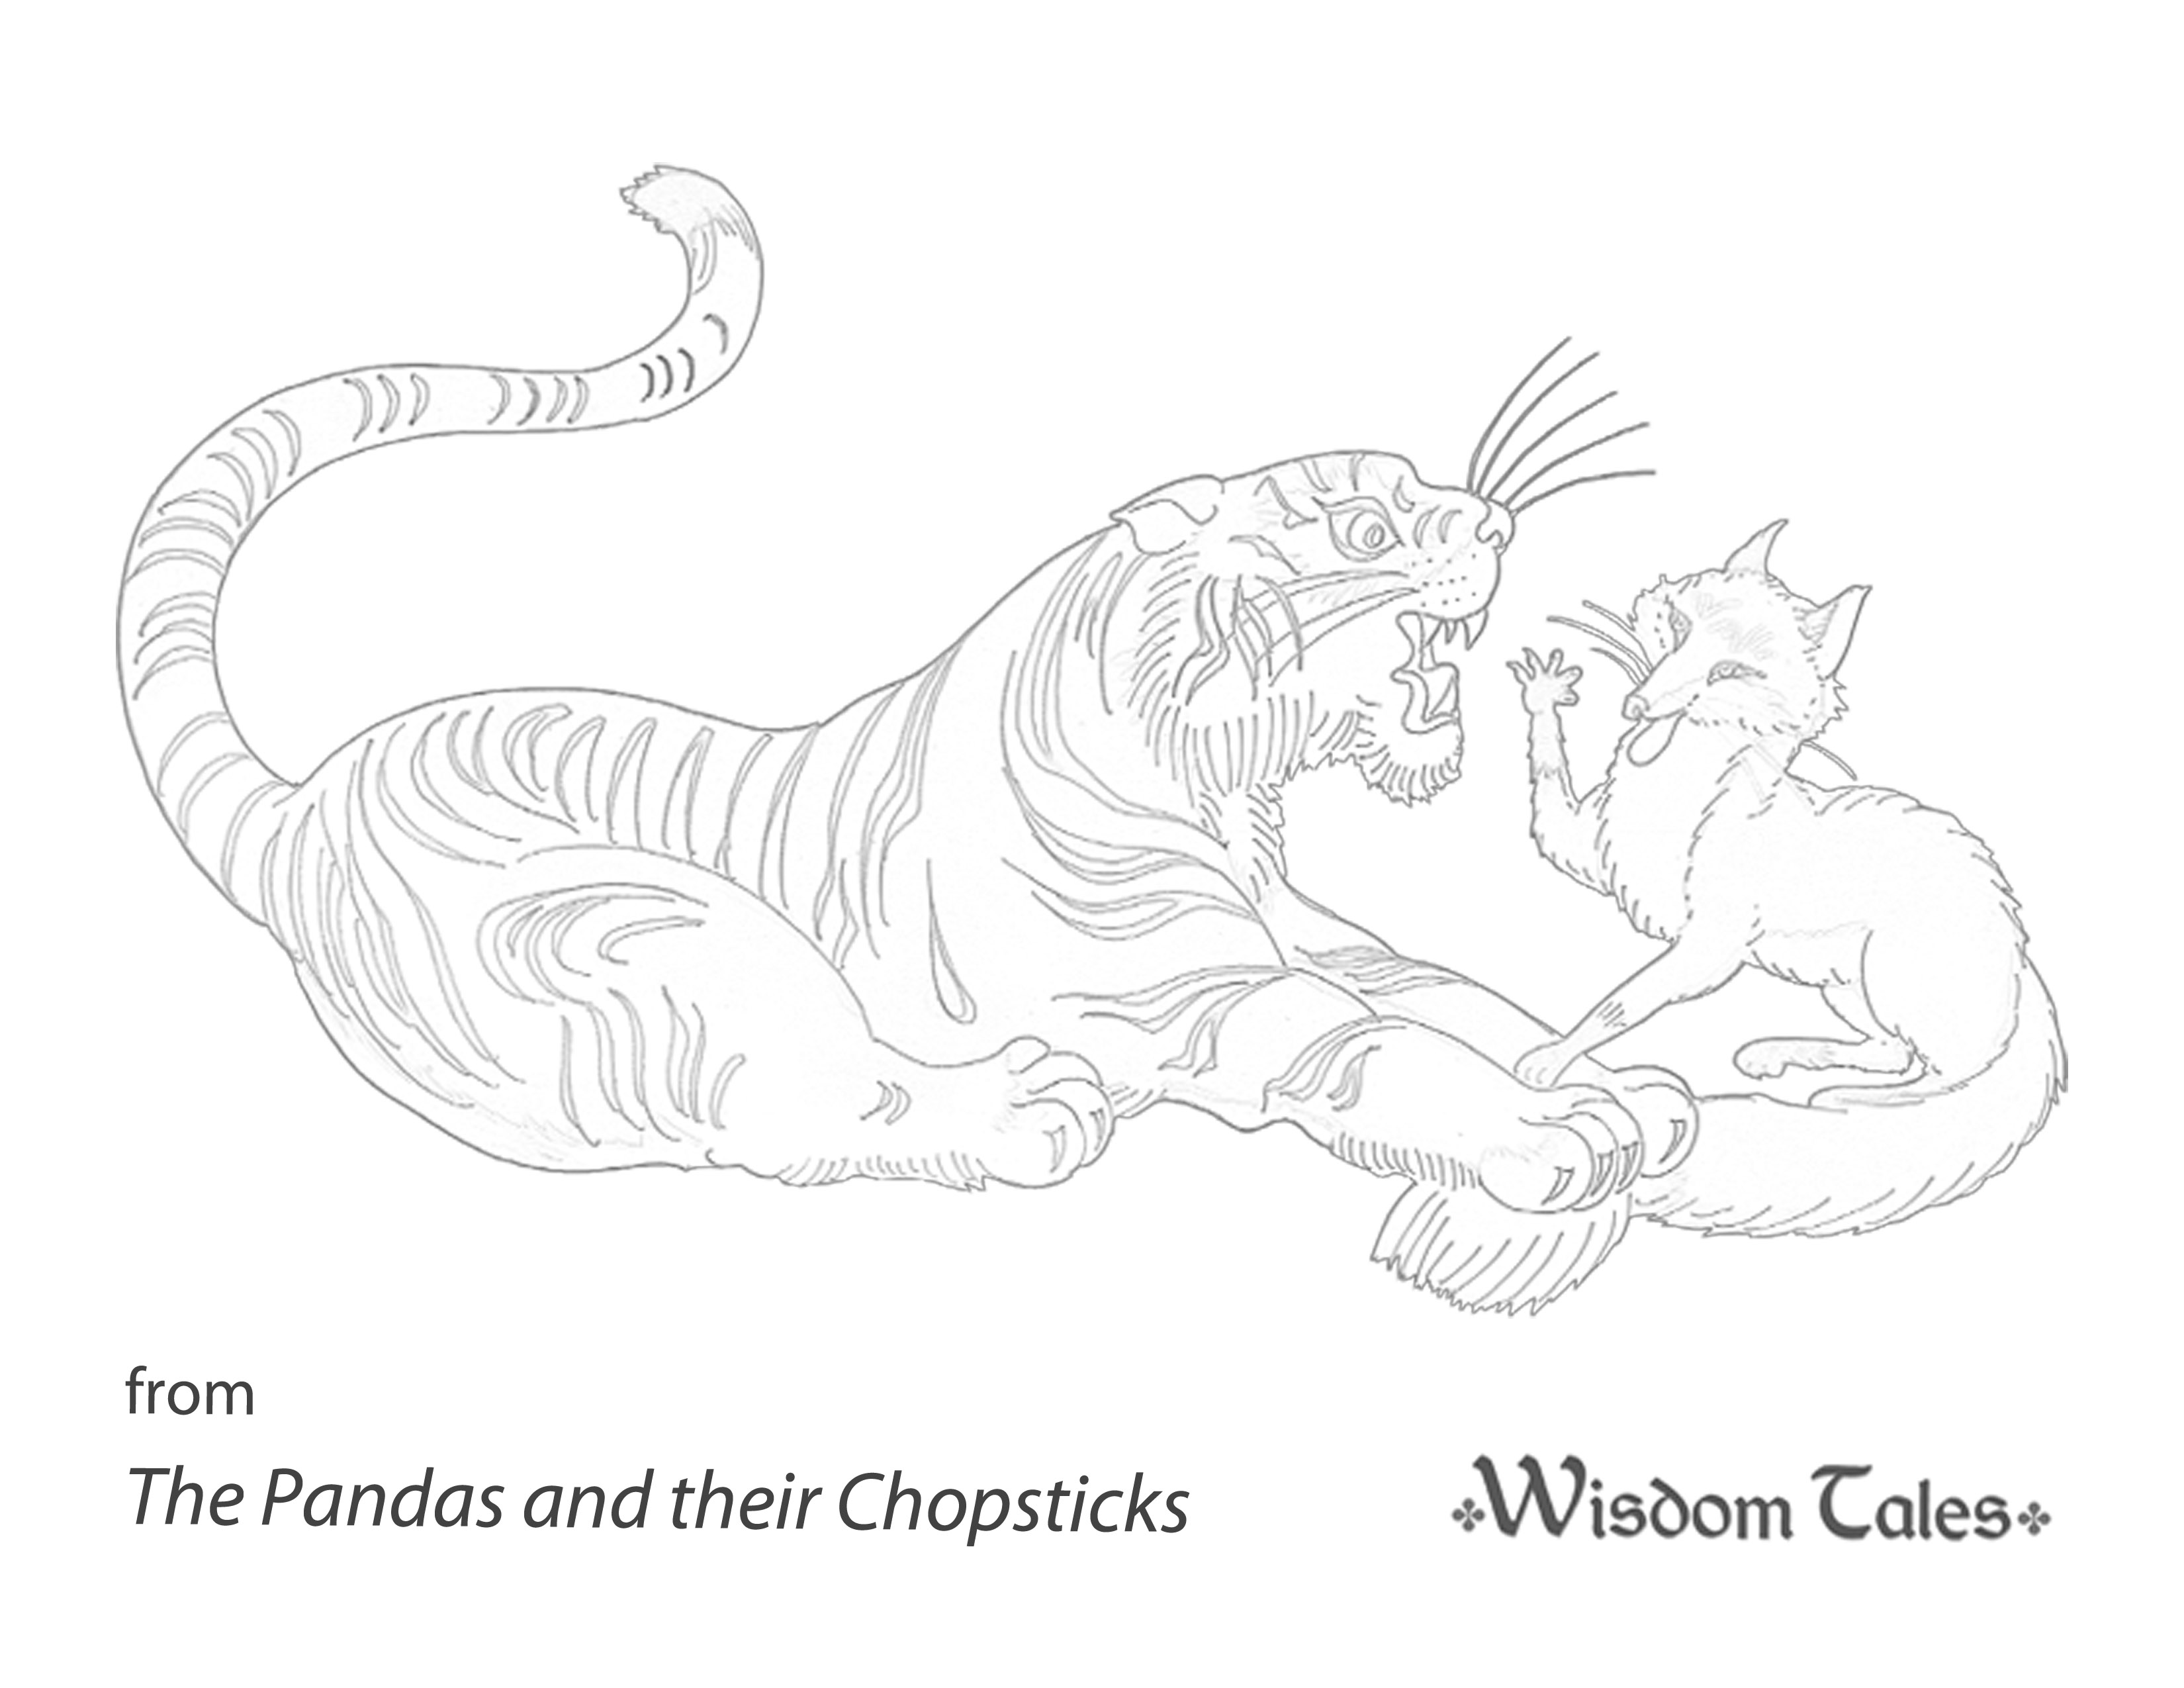 The Pandas and Their Chopsticks